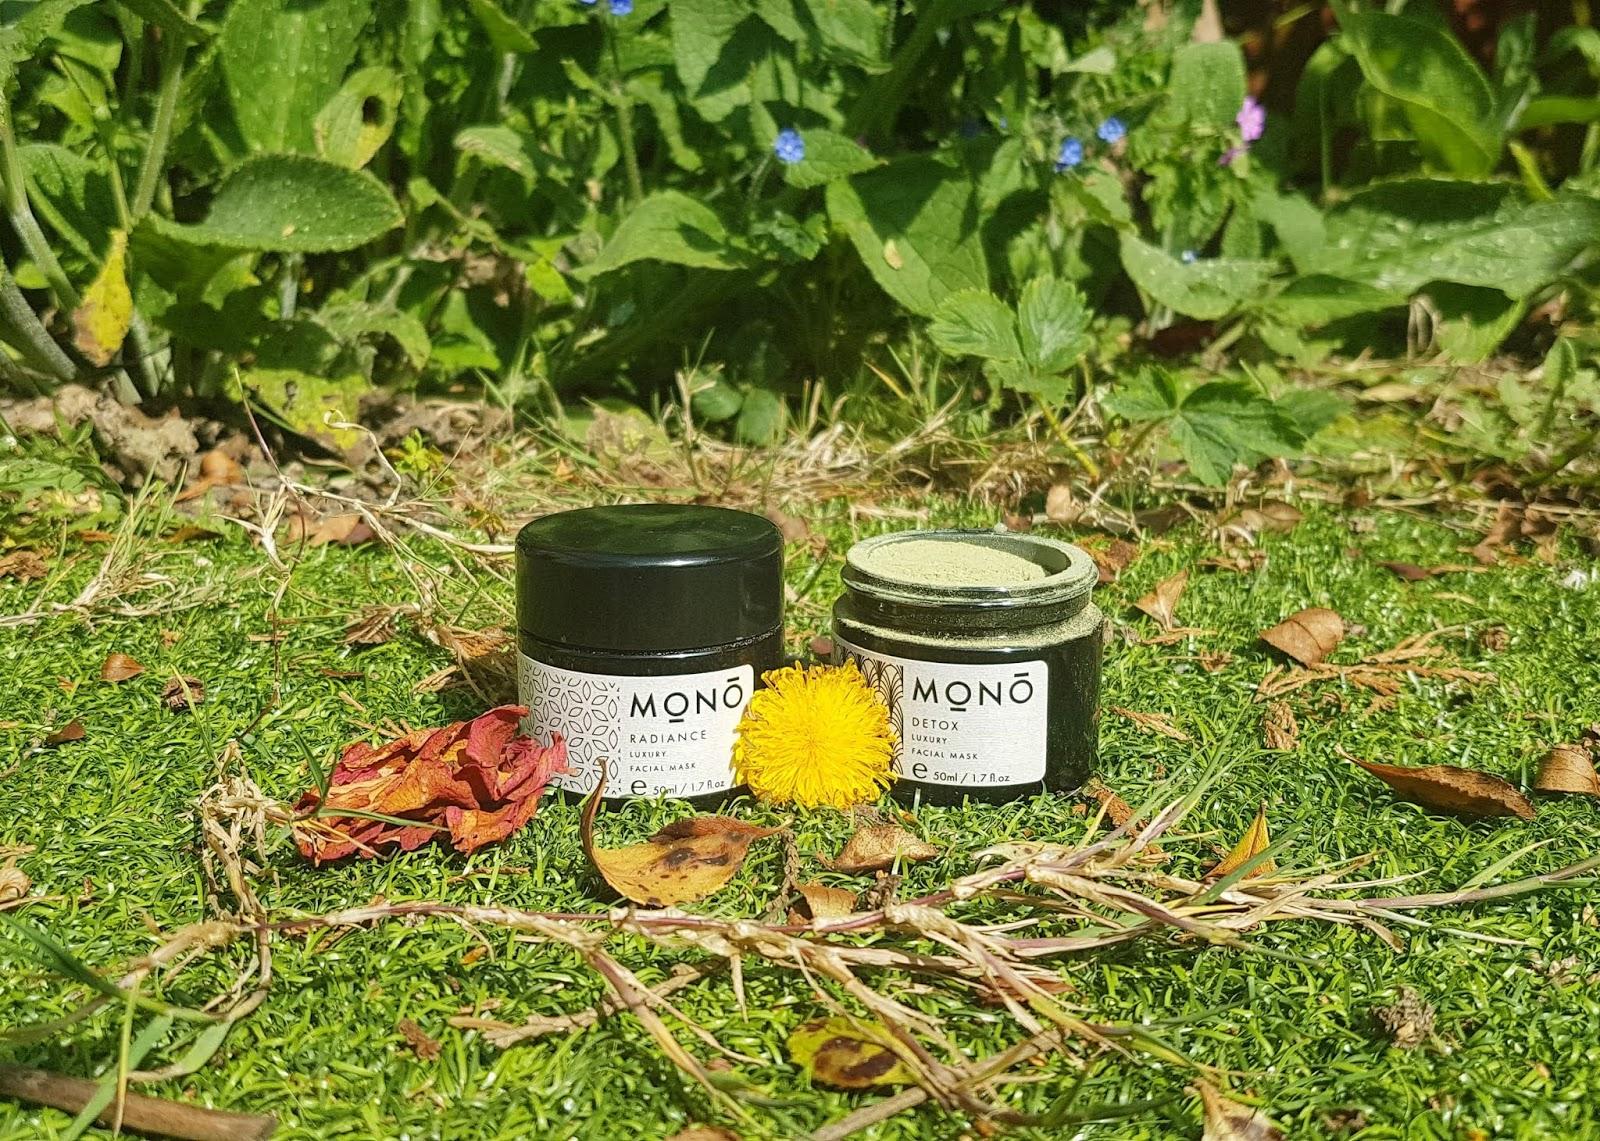 Mono Naturoils Face Mask - Detox + Radiance